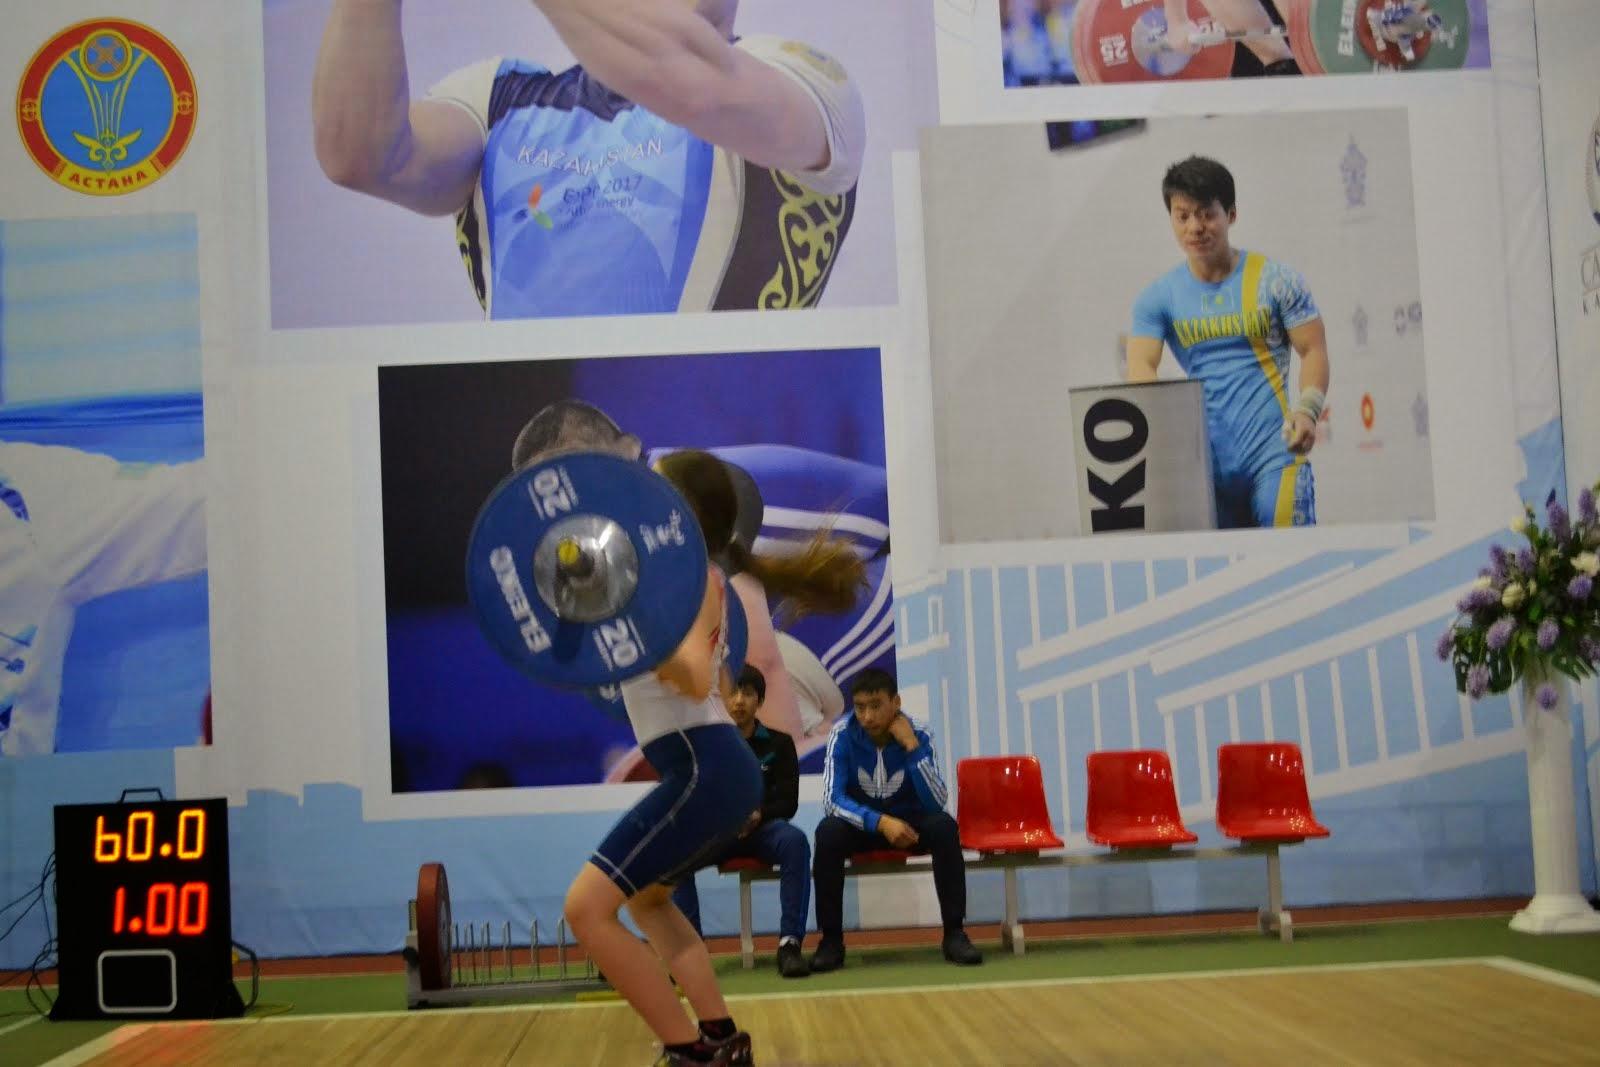 LG Gwendolyn Rojas at the 2015 Kazakhstan Youth Nationals